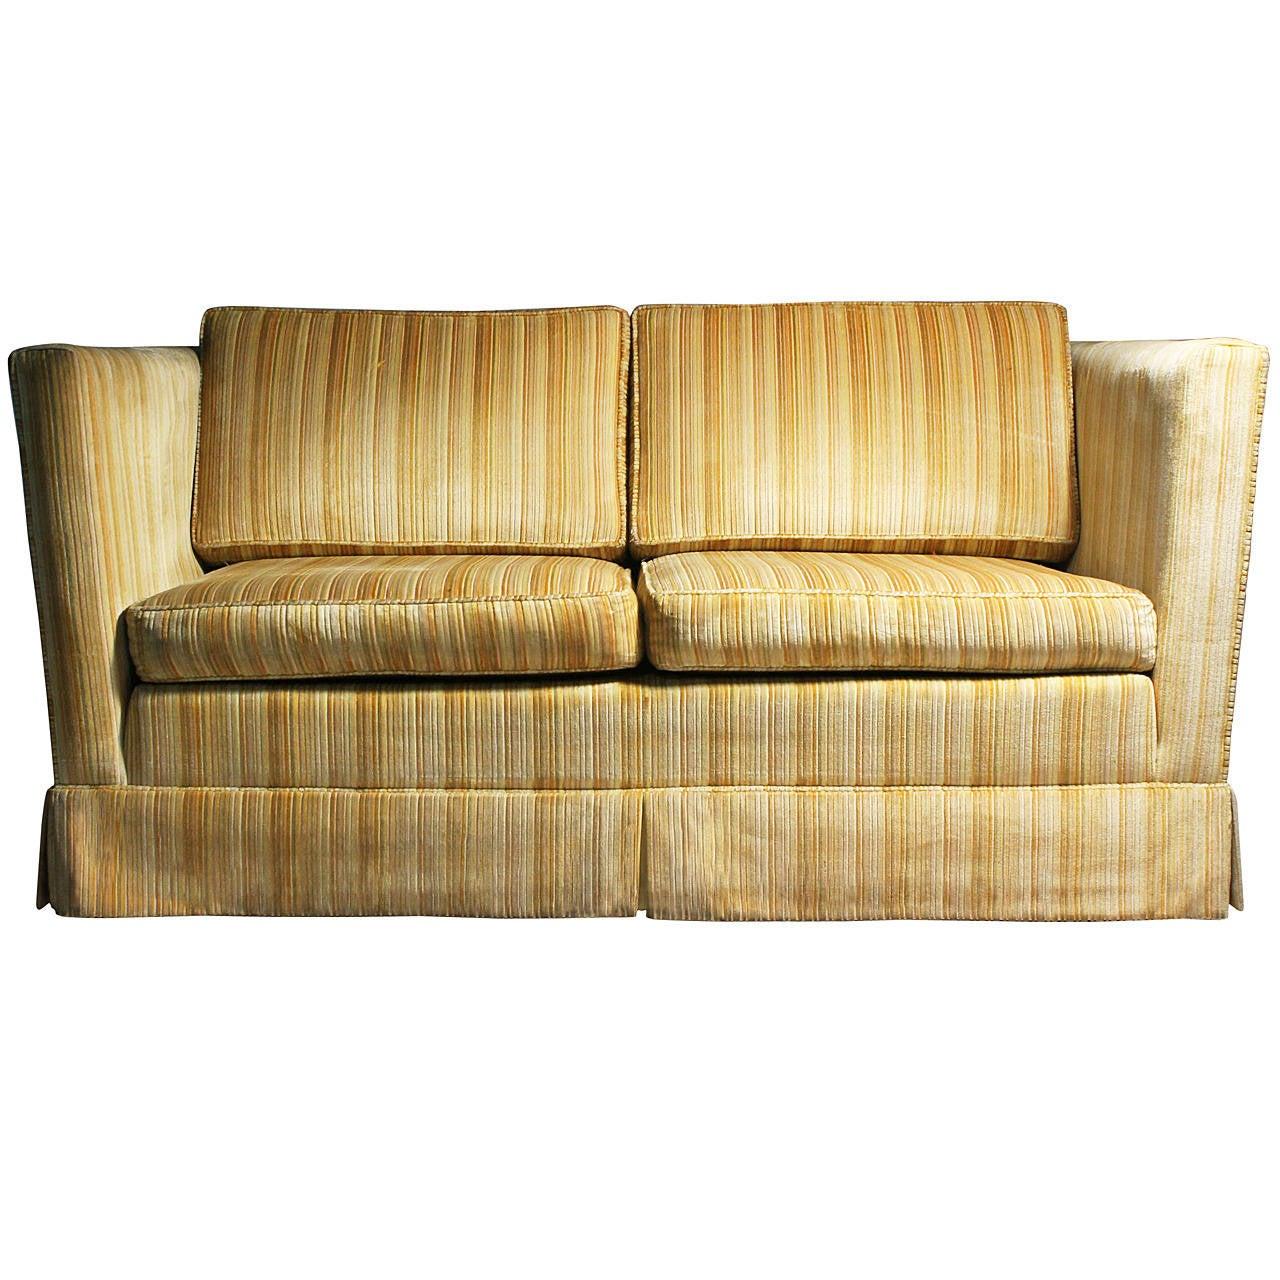 Tuxedo Loveseat Sofa on Castors Dunbar Edward Wormley / style Milo Baughman  1